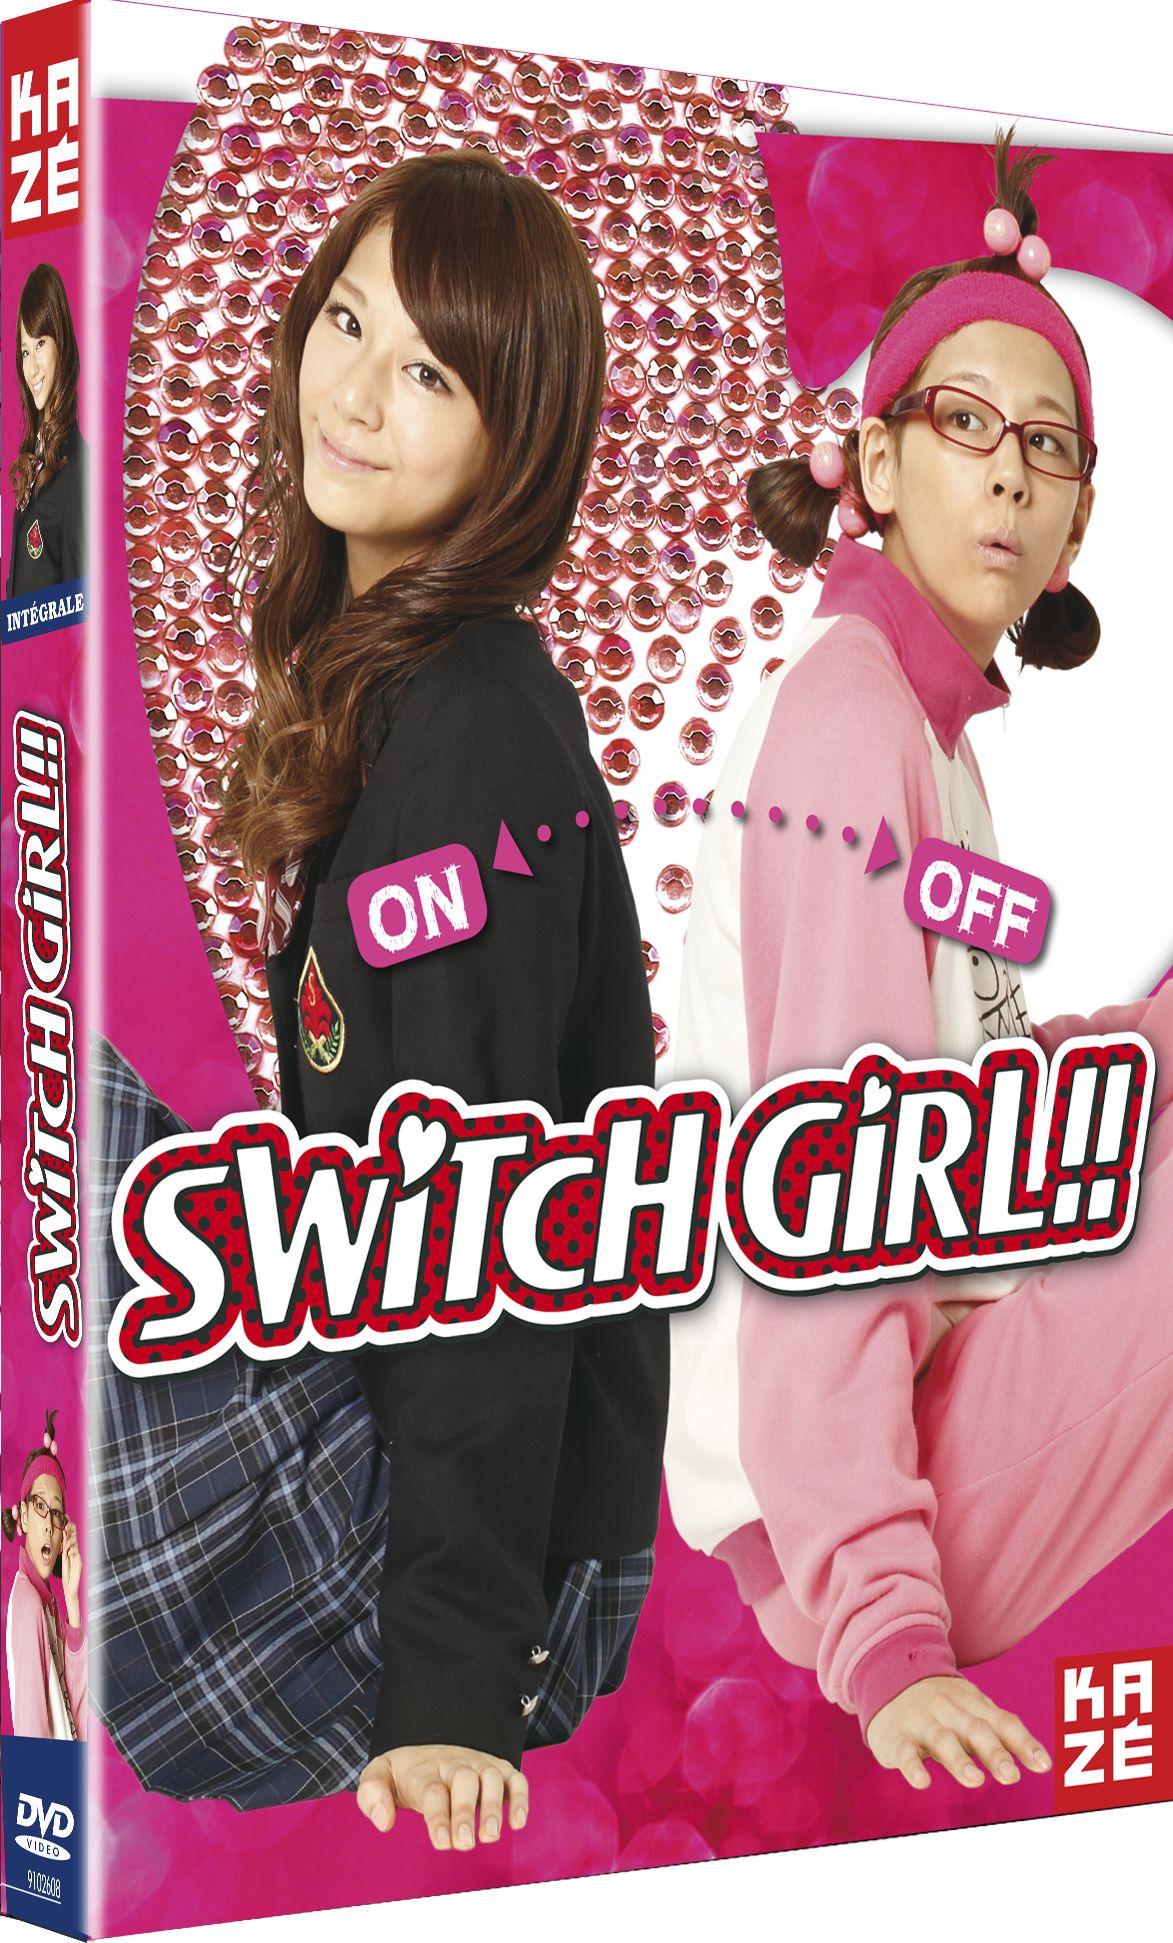 http://www.manga-news.com/public/images/dvd/switch-girl-integrale-dvd-drama.jpg